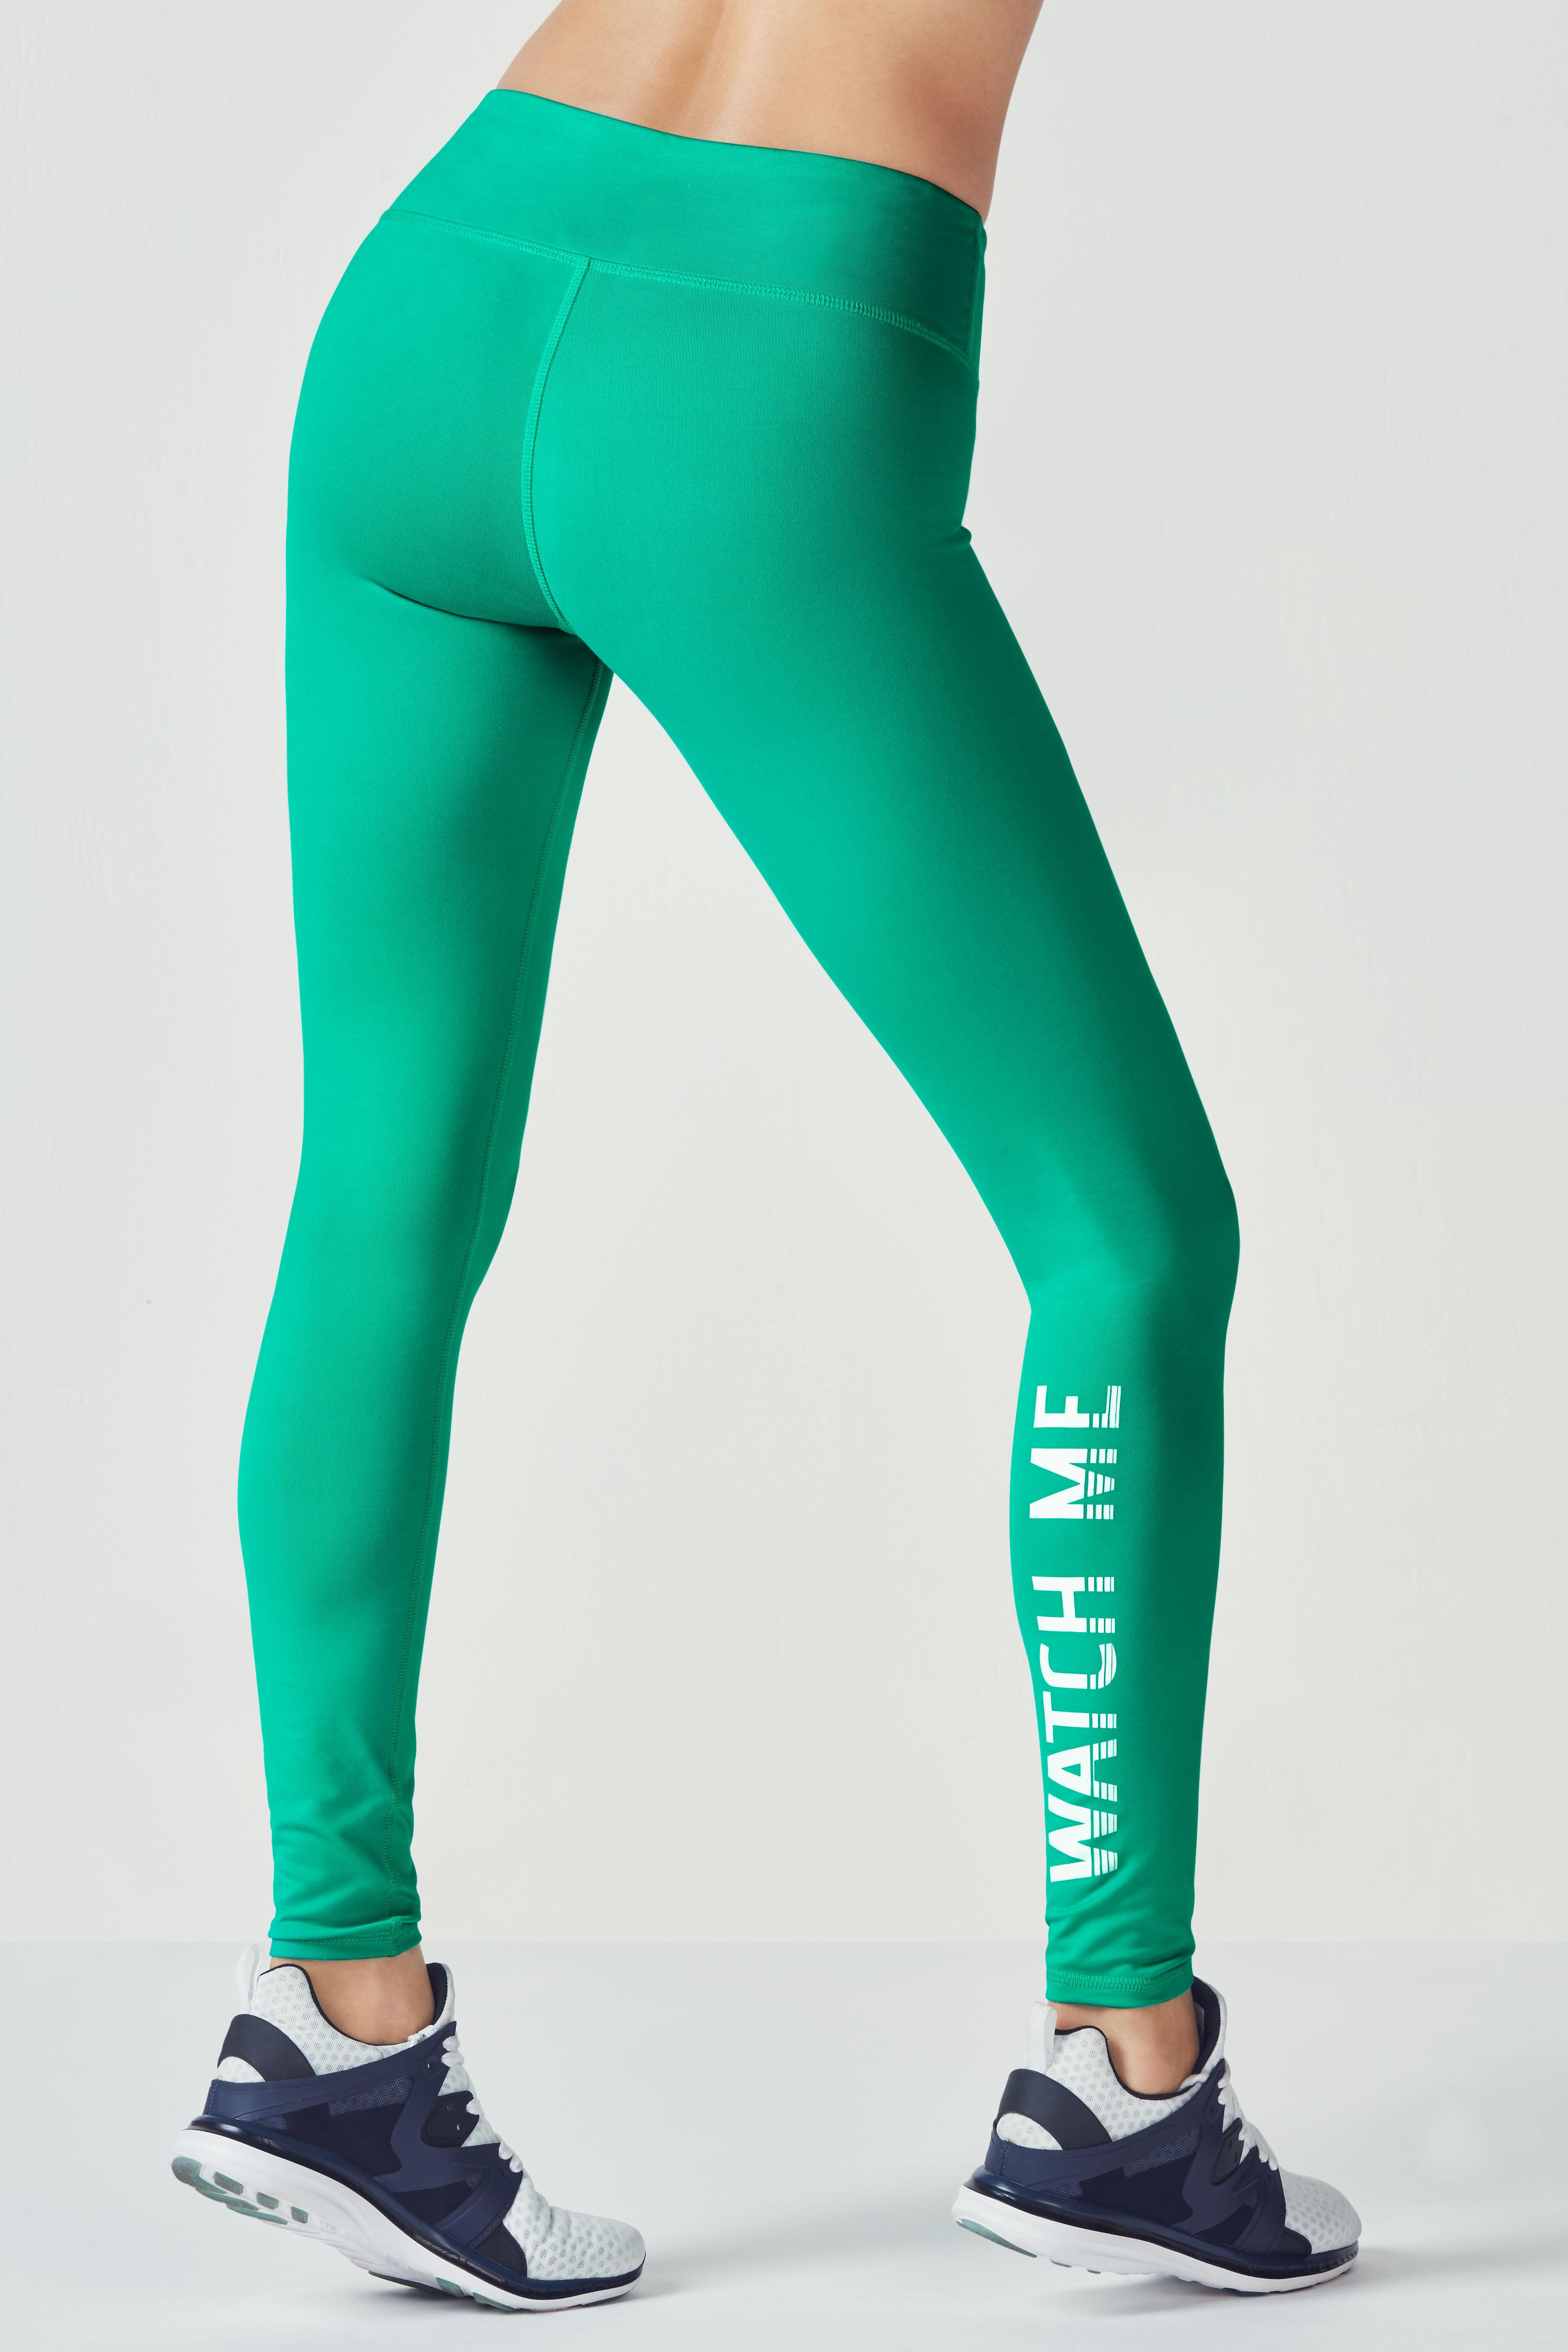 cfcda38fa6ecac Salar Printed PowerHold® Legging - Bali/Watch Me Print